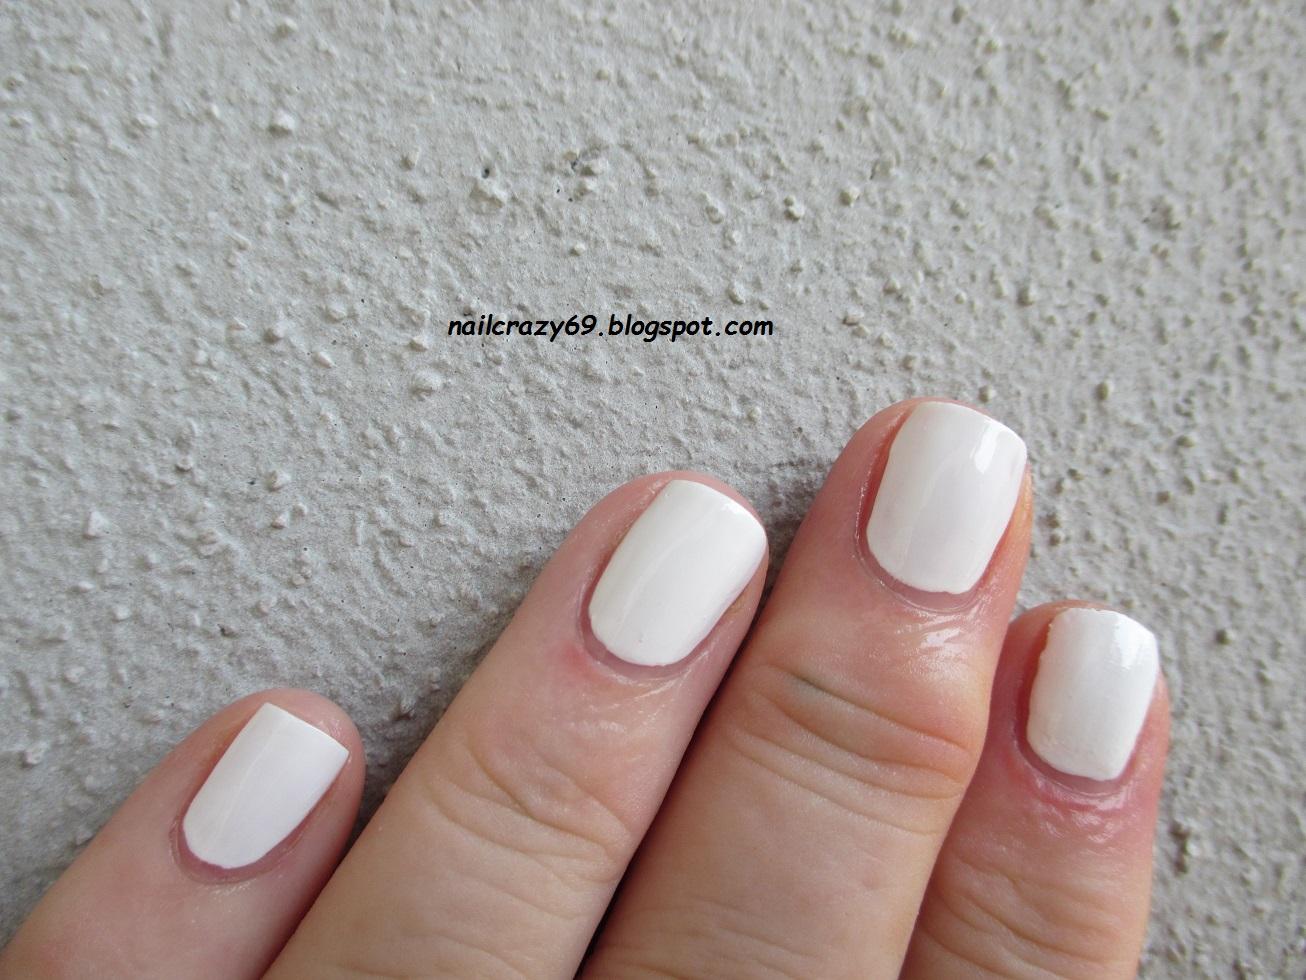 Nail crazy: Matching Manicure Sunday - Butterfly